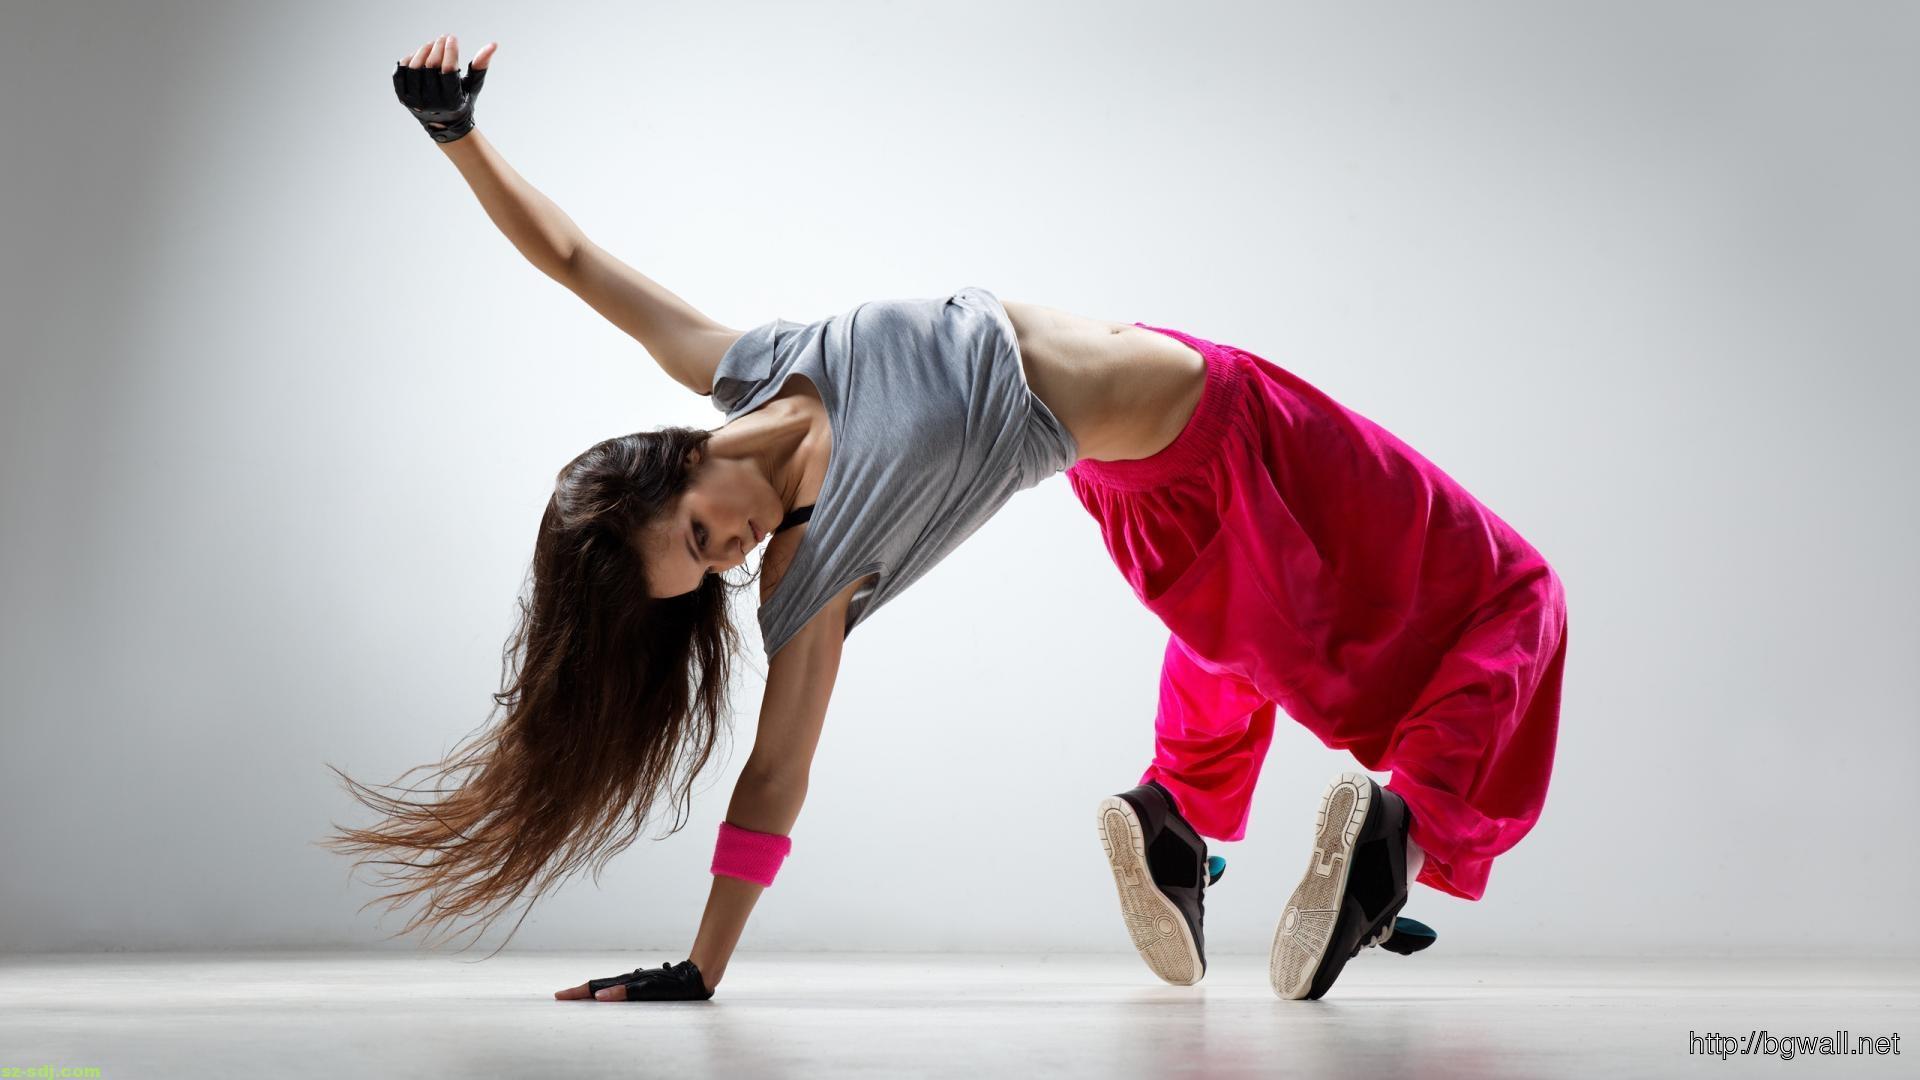 dance wallpaper cool girl - photo #25